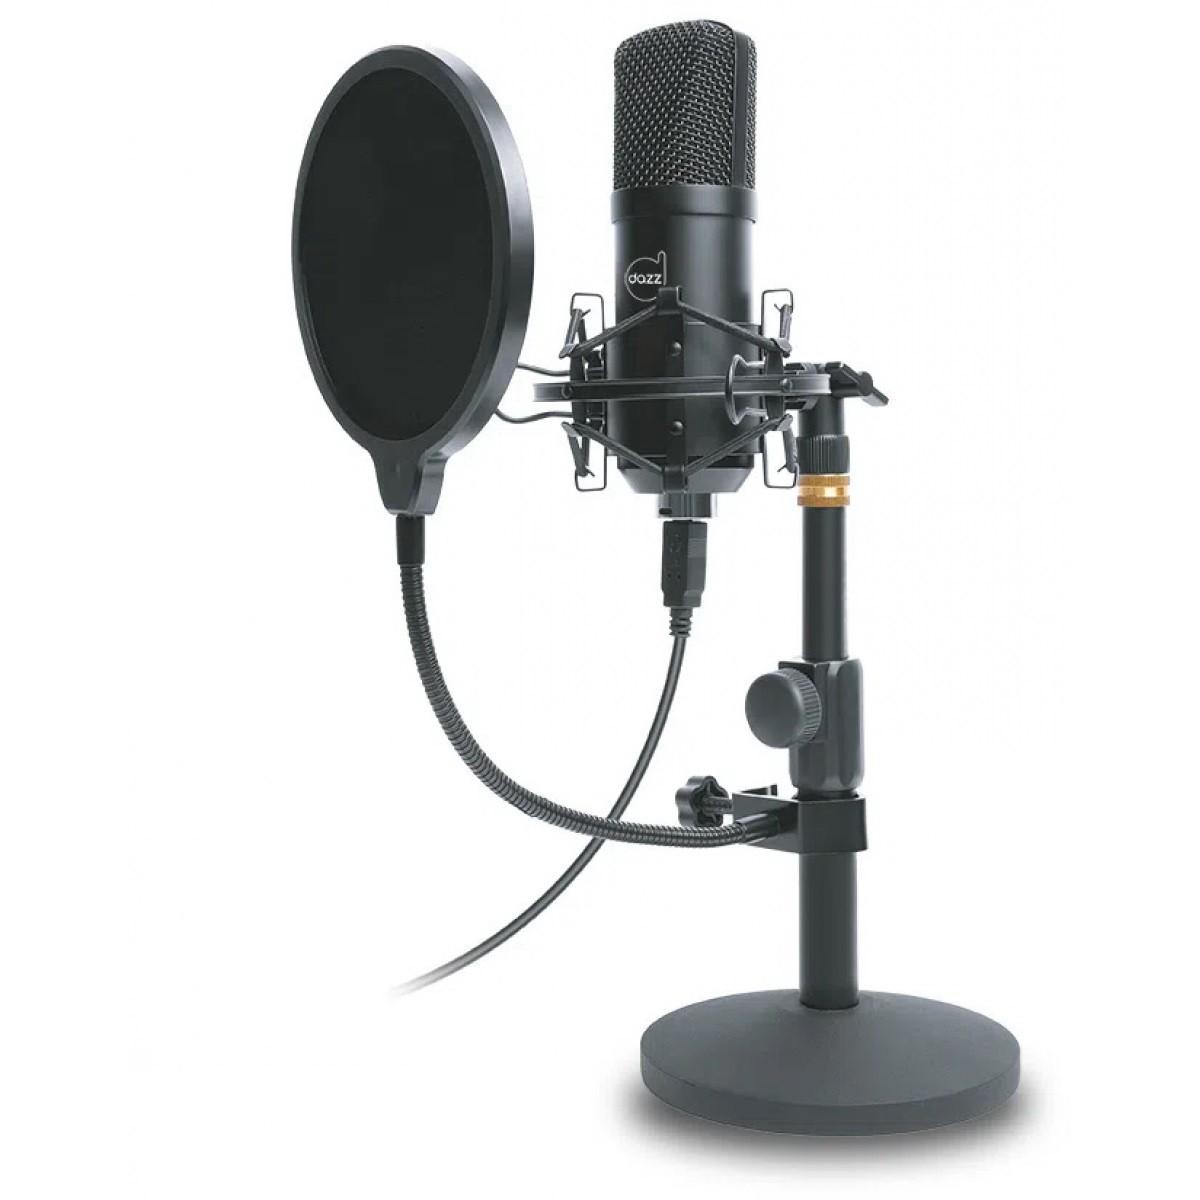 Microfone Gamer Dazz Broadcaster Pro, USB 2.0 - 601456-8